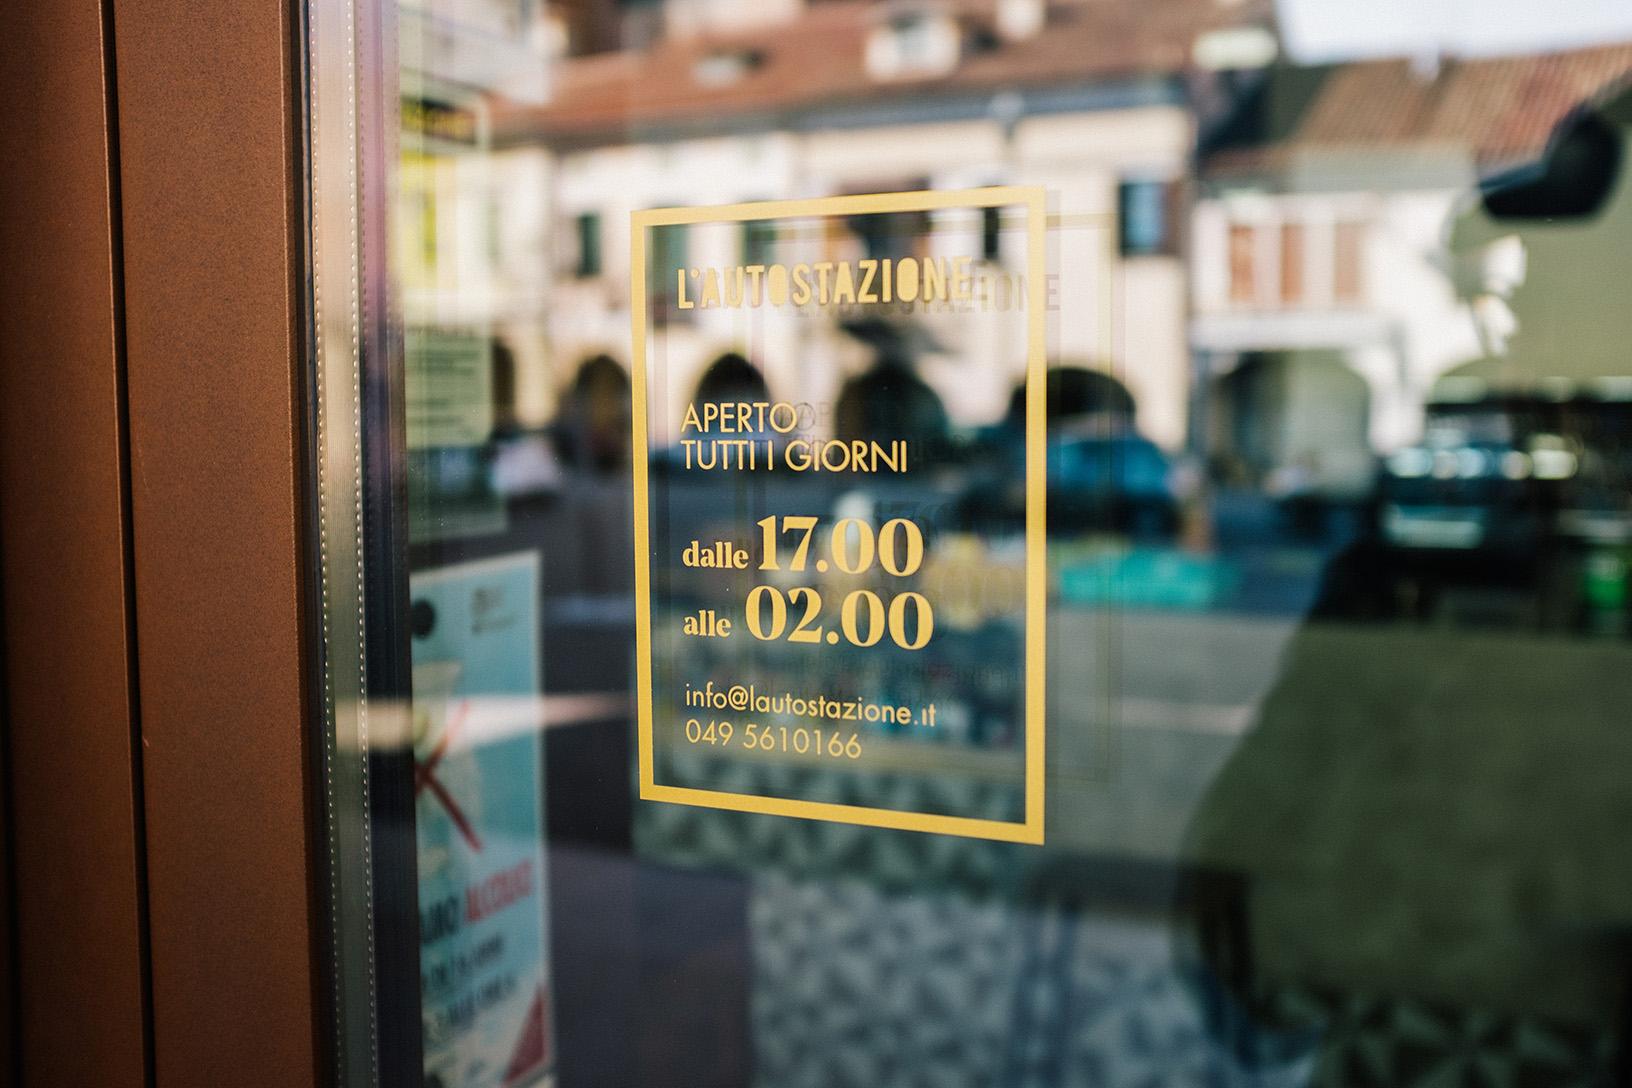 Autostazione-opening hours.jpg